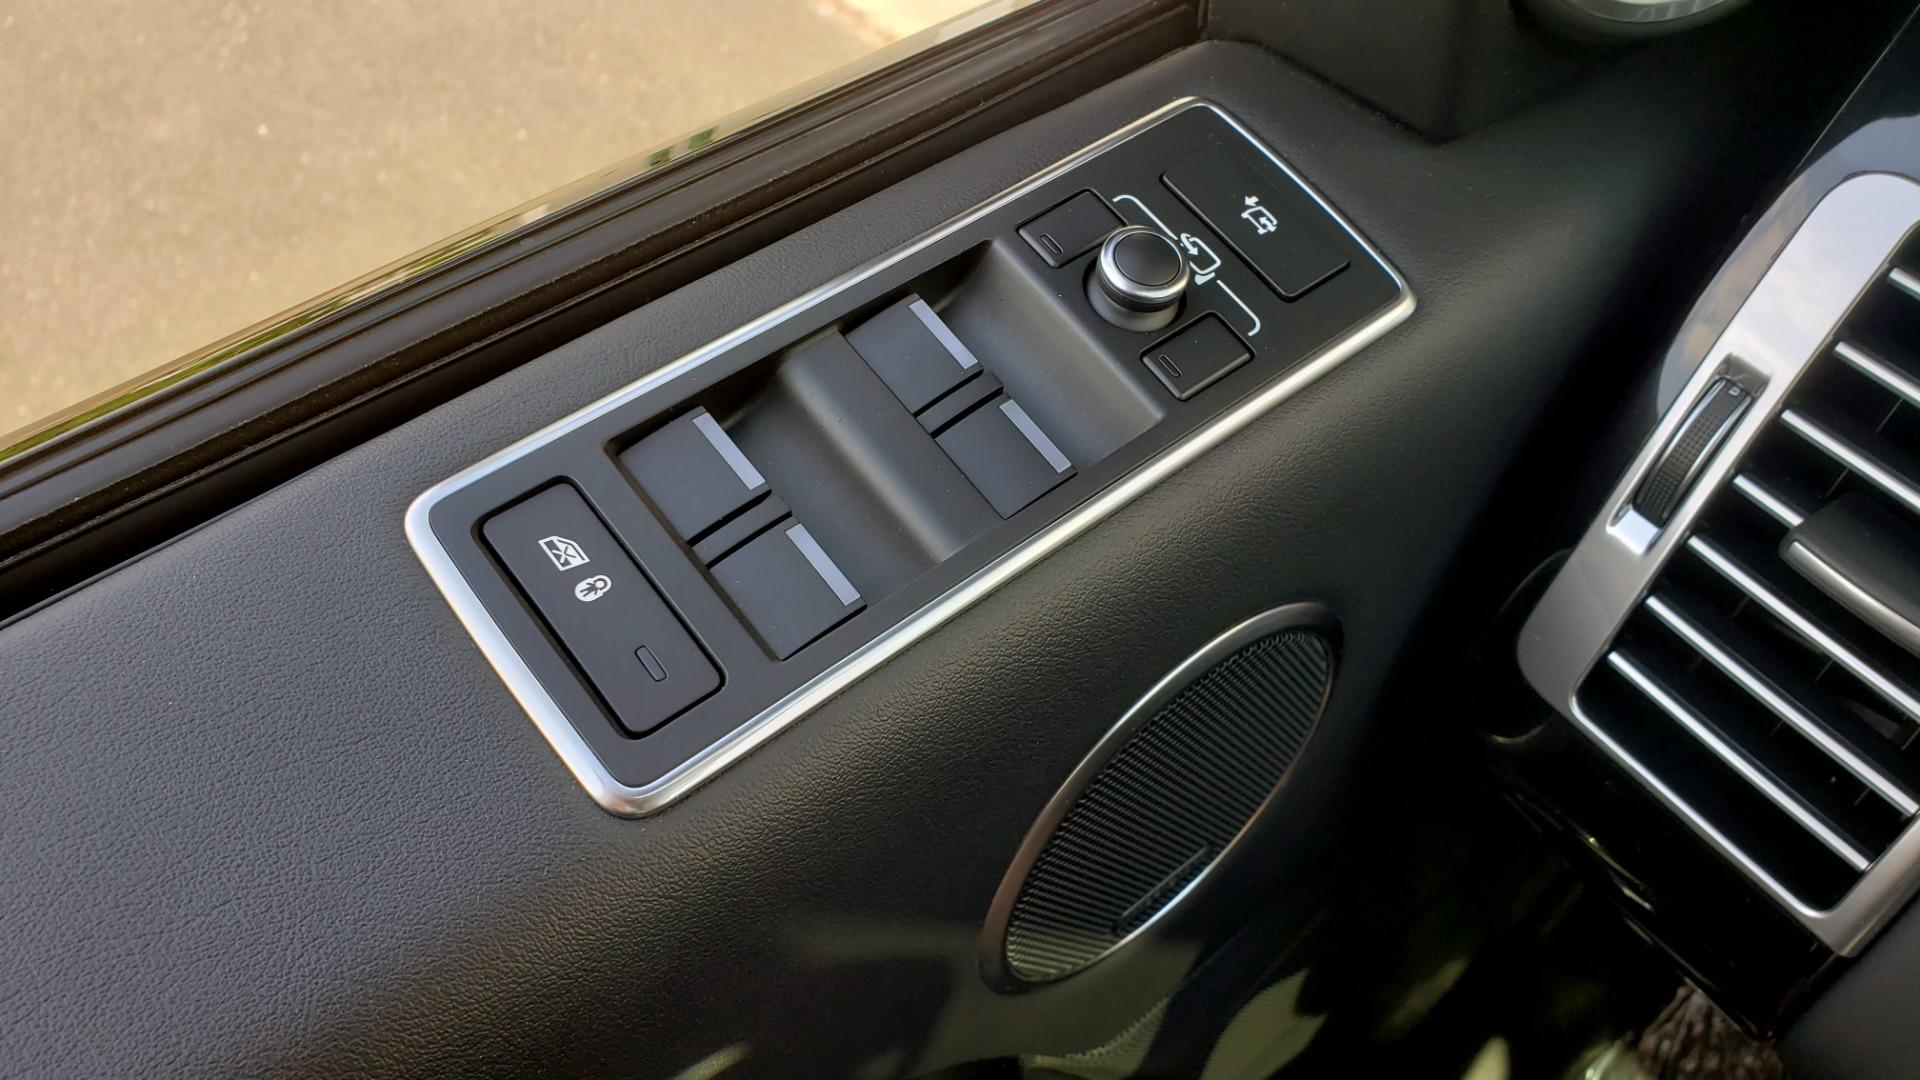 Used 2017 Land Rover RANGE ROVER SC V8 / VISION ASST / DRIVE PKG / MERIDIAN SOUND / PANO-ROOF / NAV / BSM for sale $75,995 at Formula Imports in Charlotte NC 28227 51